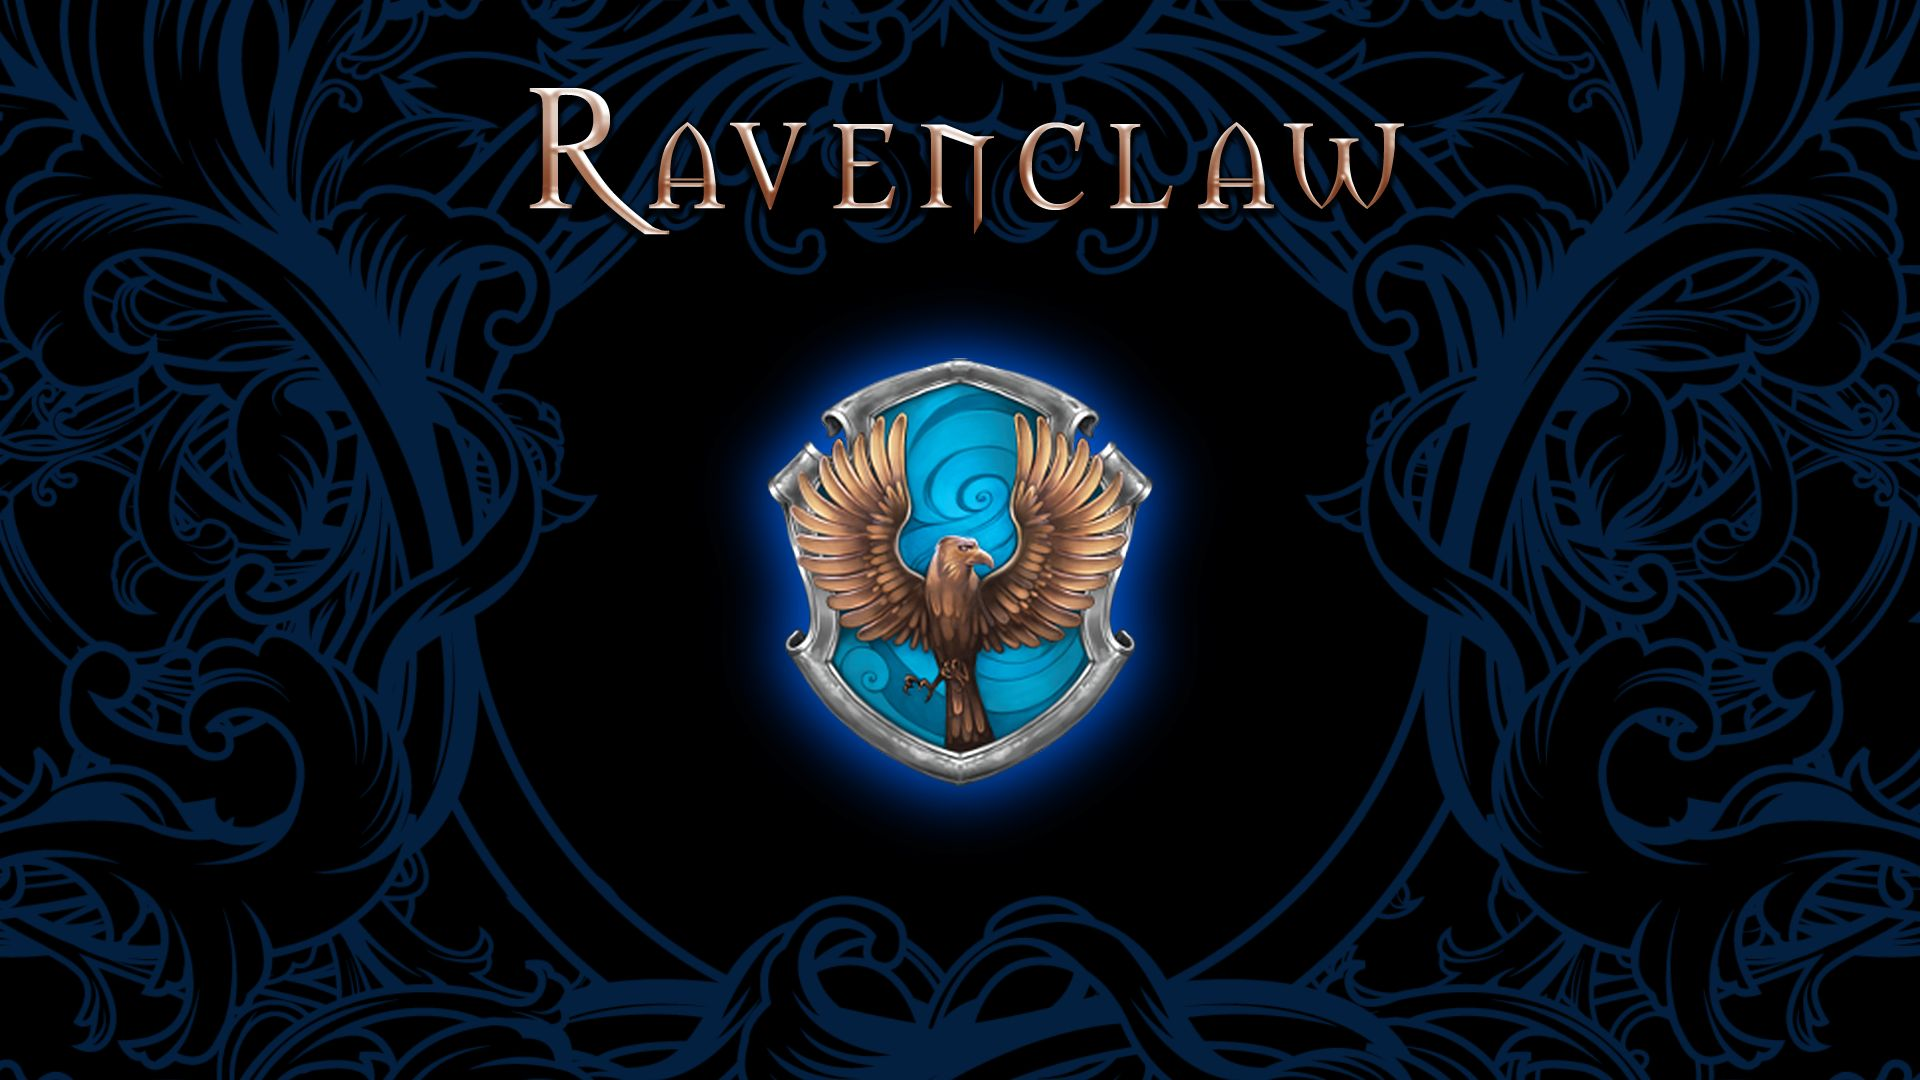 Ravenclaw full hd wallpaper for laptop